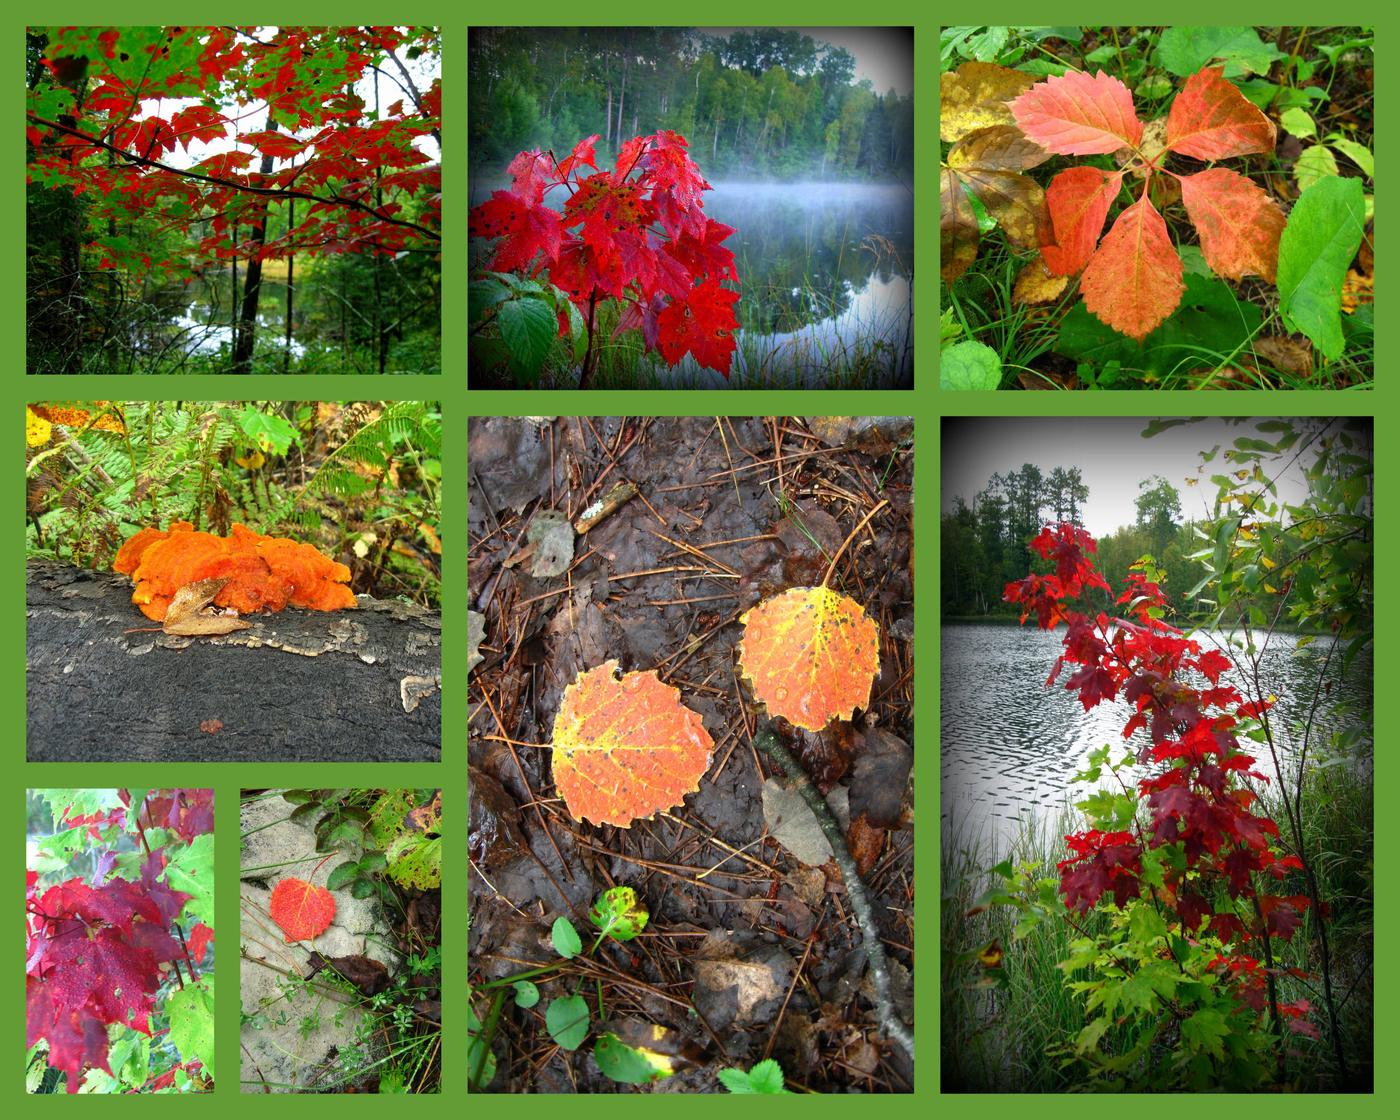 Chippewa sample of fall colorssample of fall colors